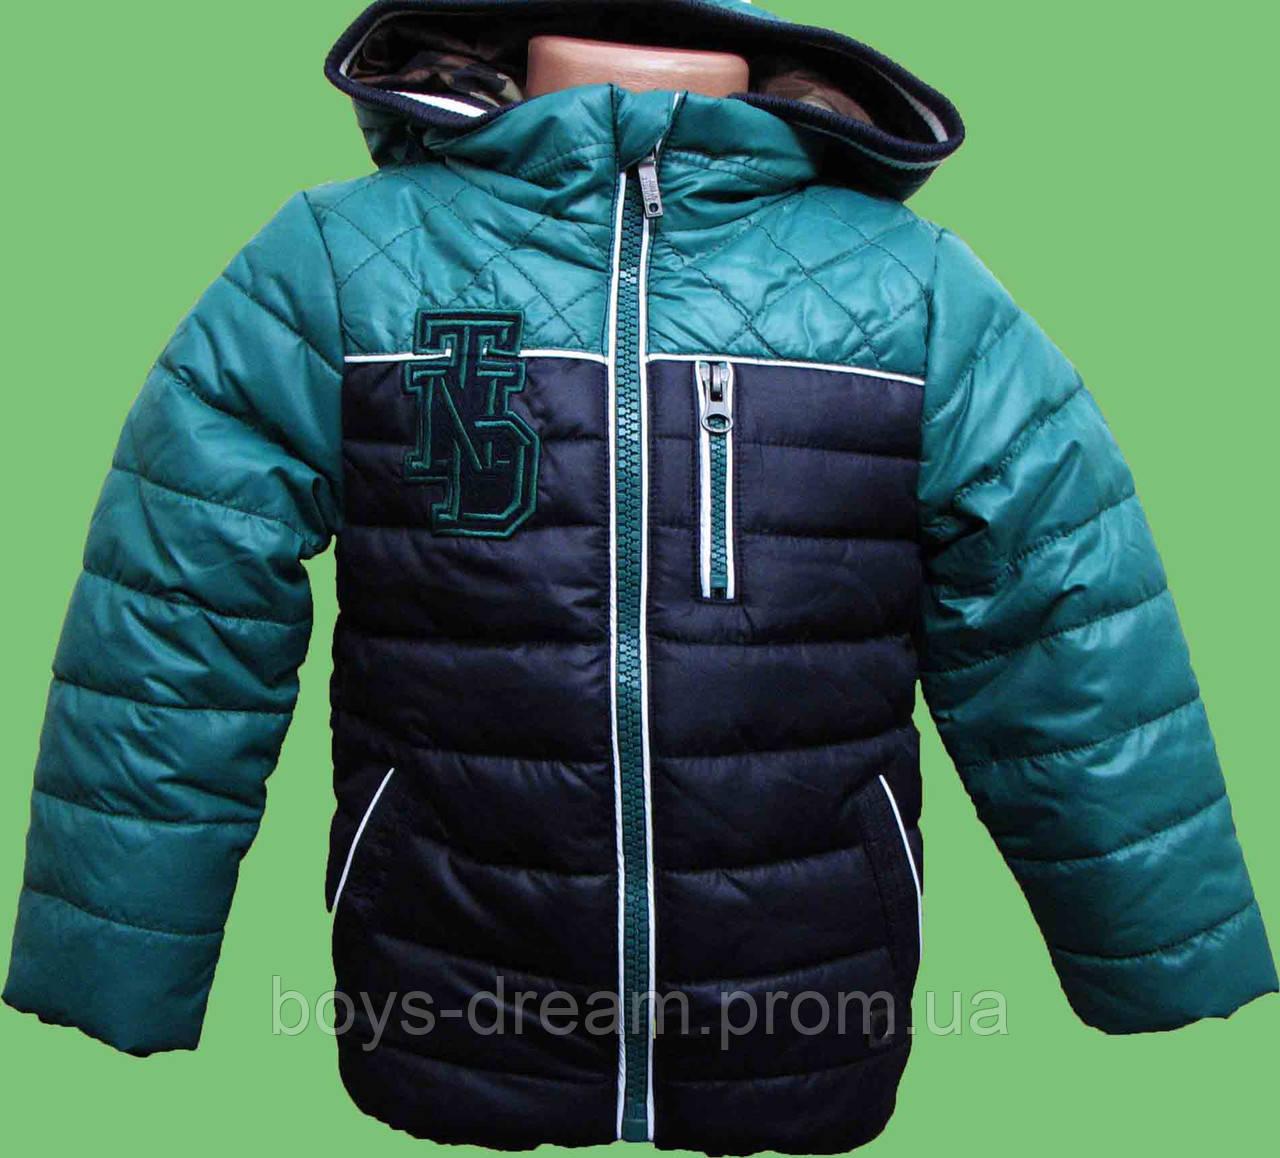 Куртка зимняя на мальчика 2-10 лет ( 98-140 ) Tumble'n Dry.